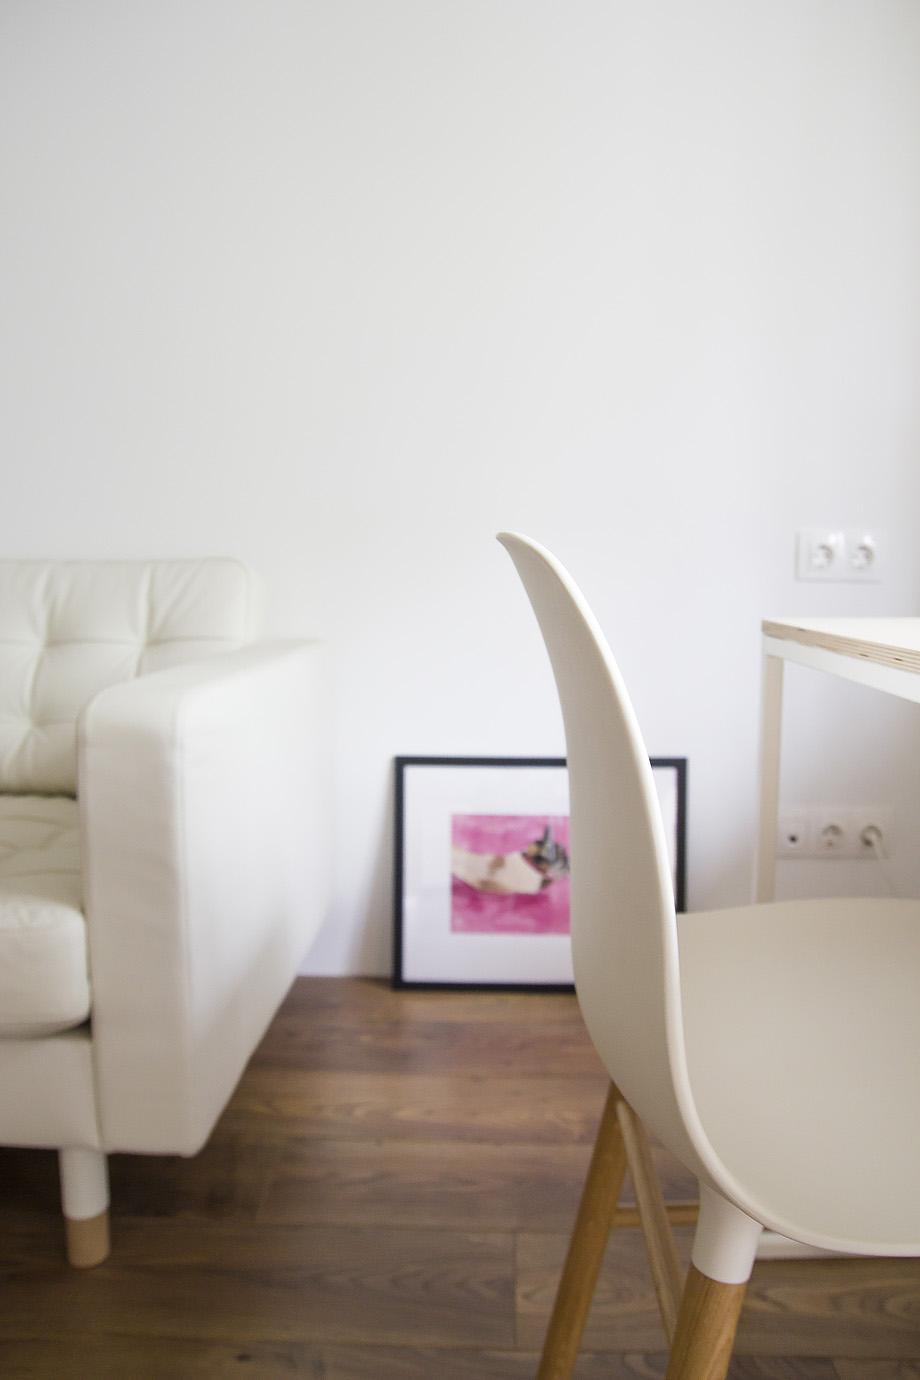 apartamento en rusia por kdva architects - foto daria koloskova (12)